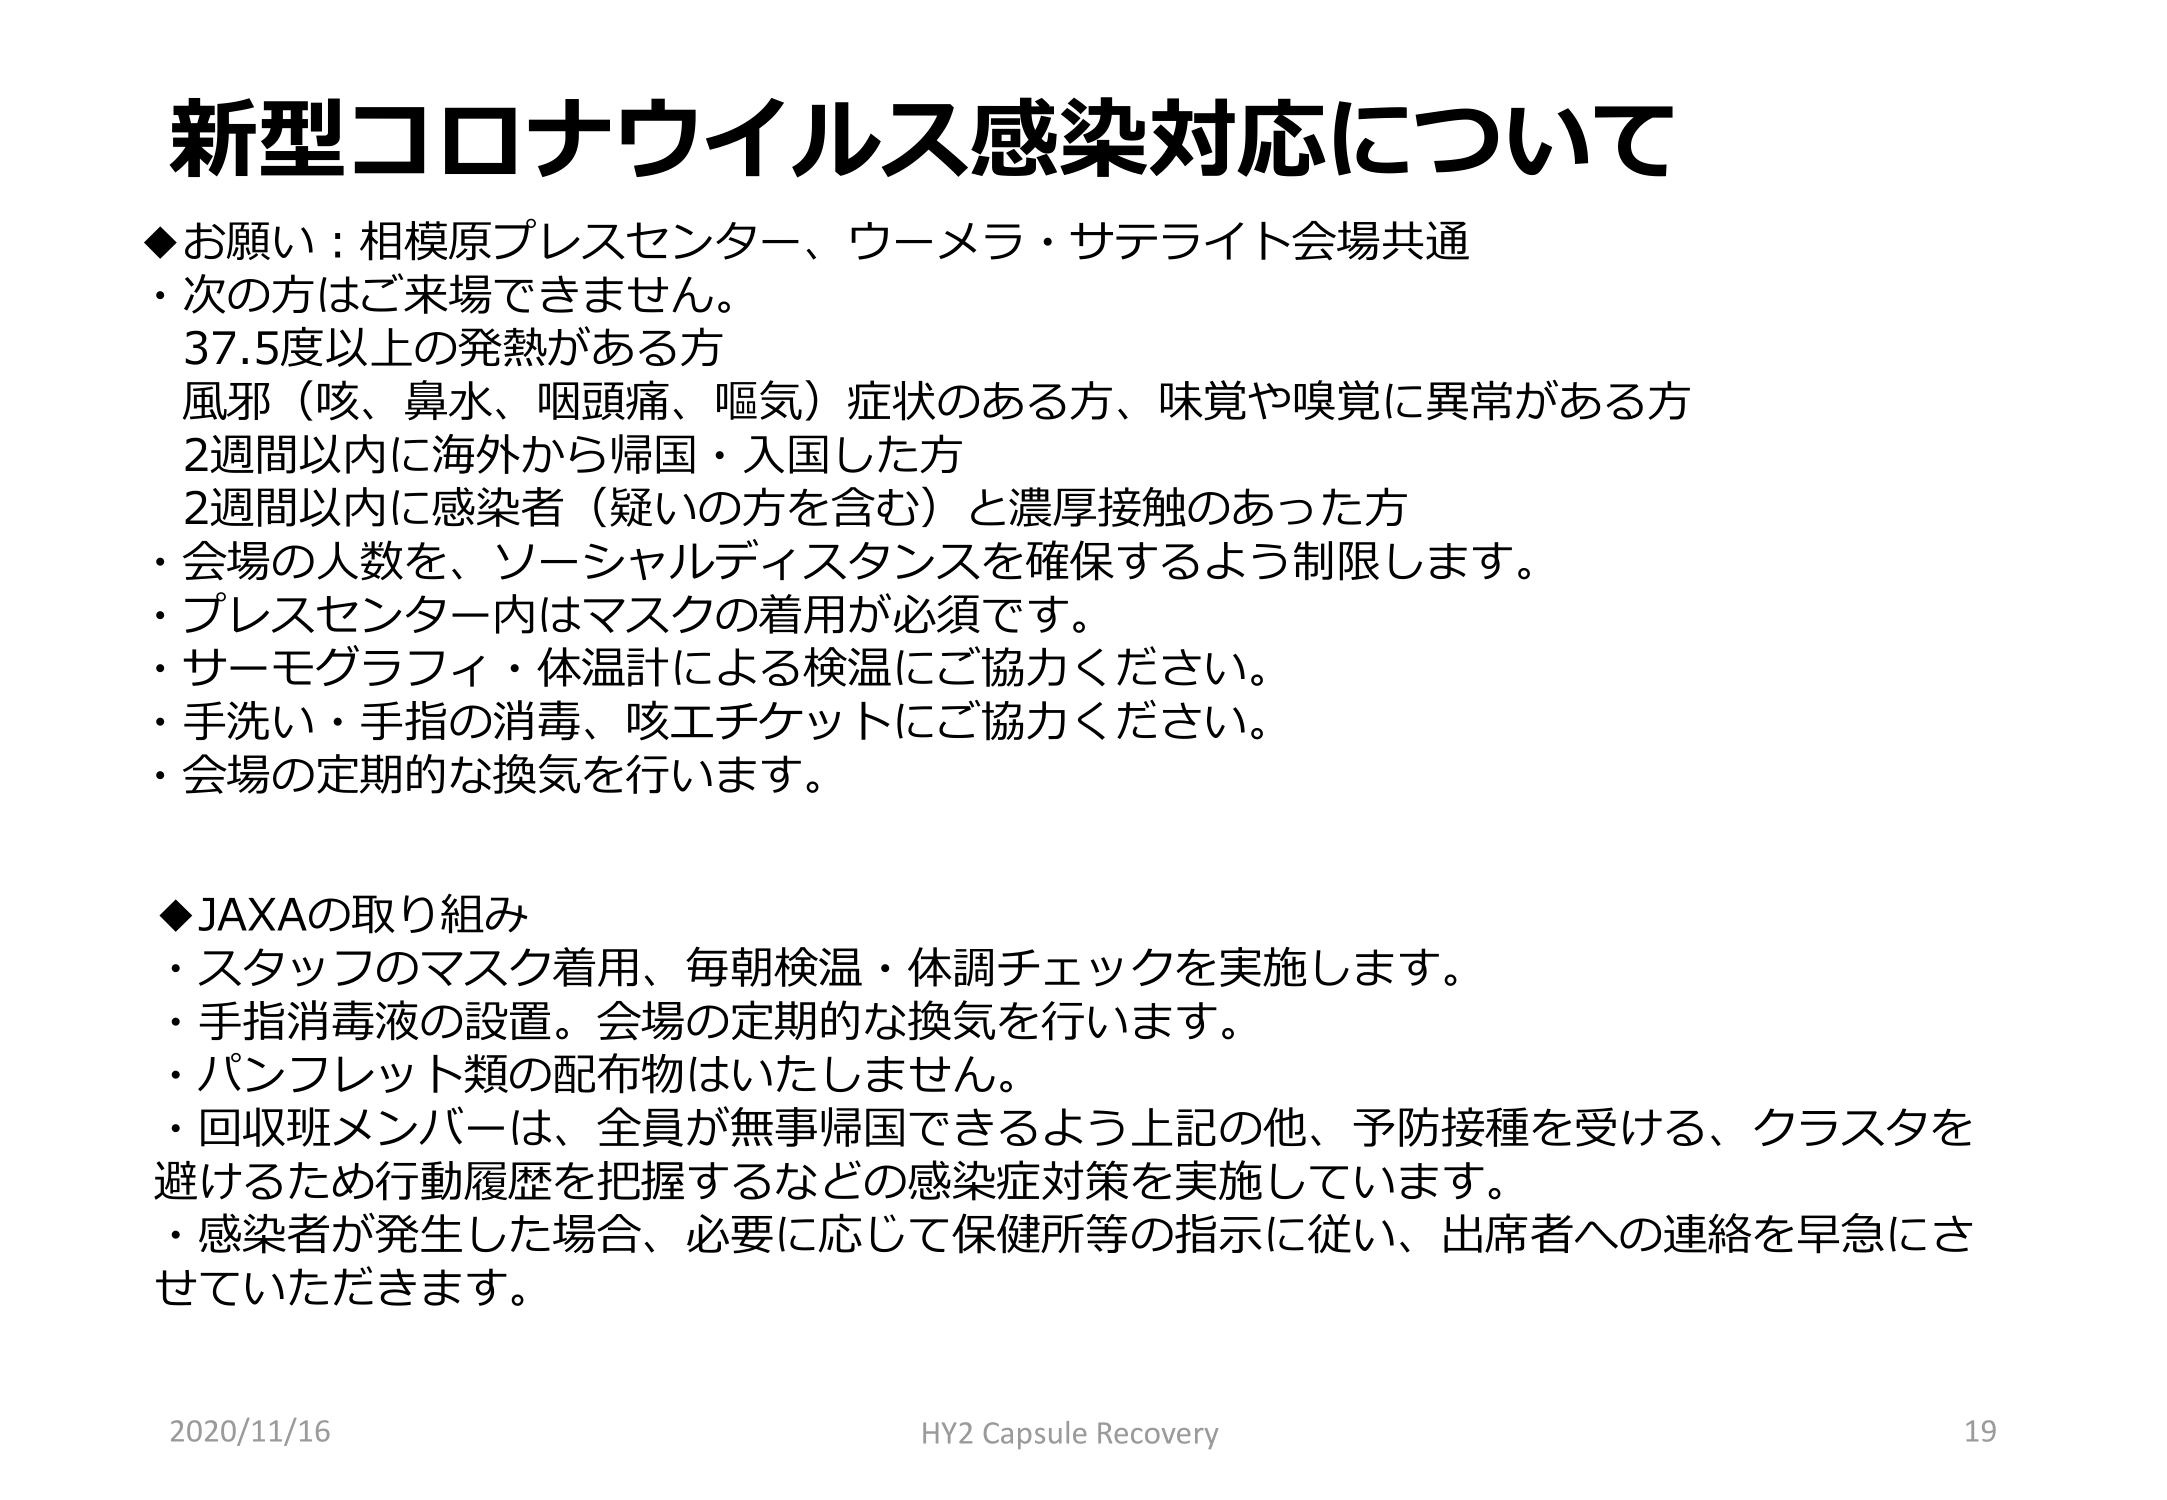 f:id:Imamura:20201117222407p:plain